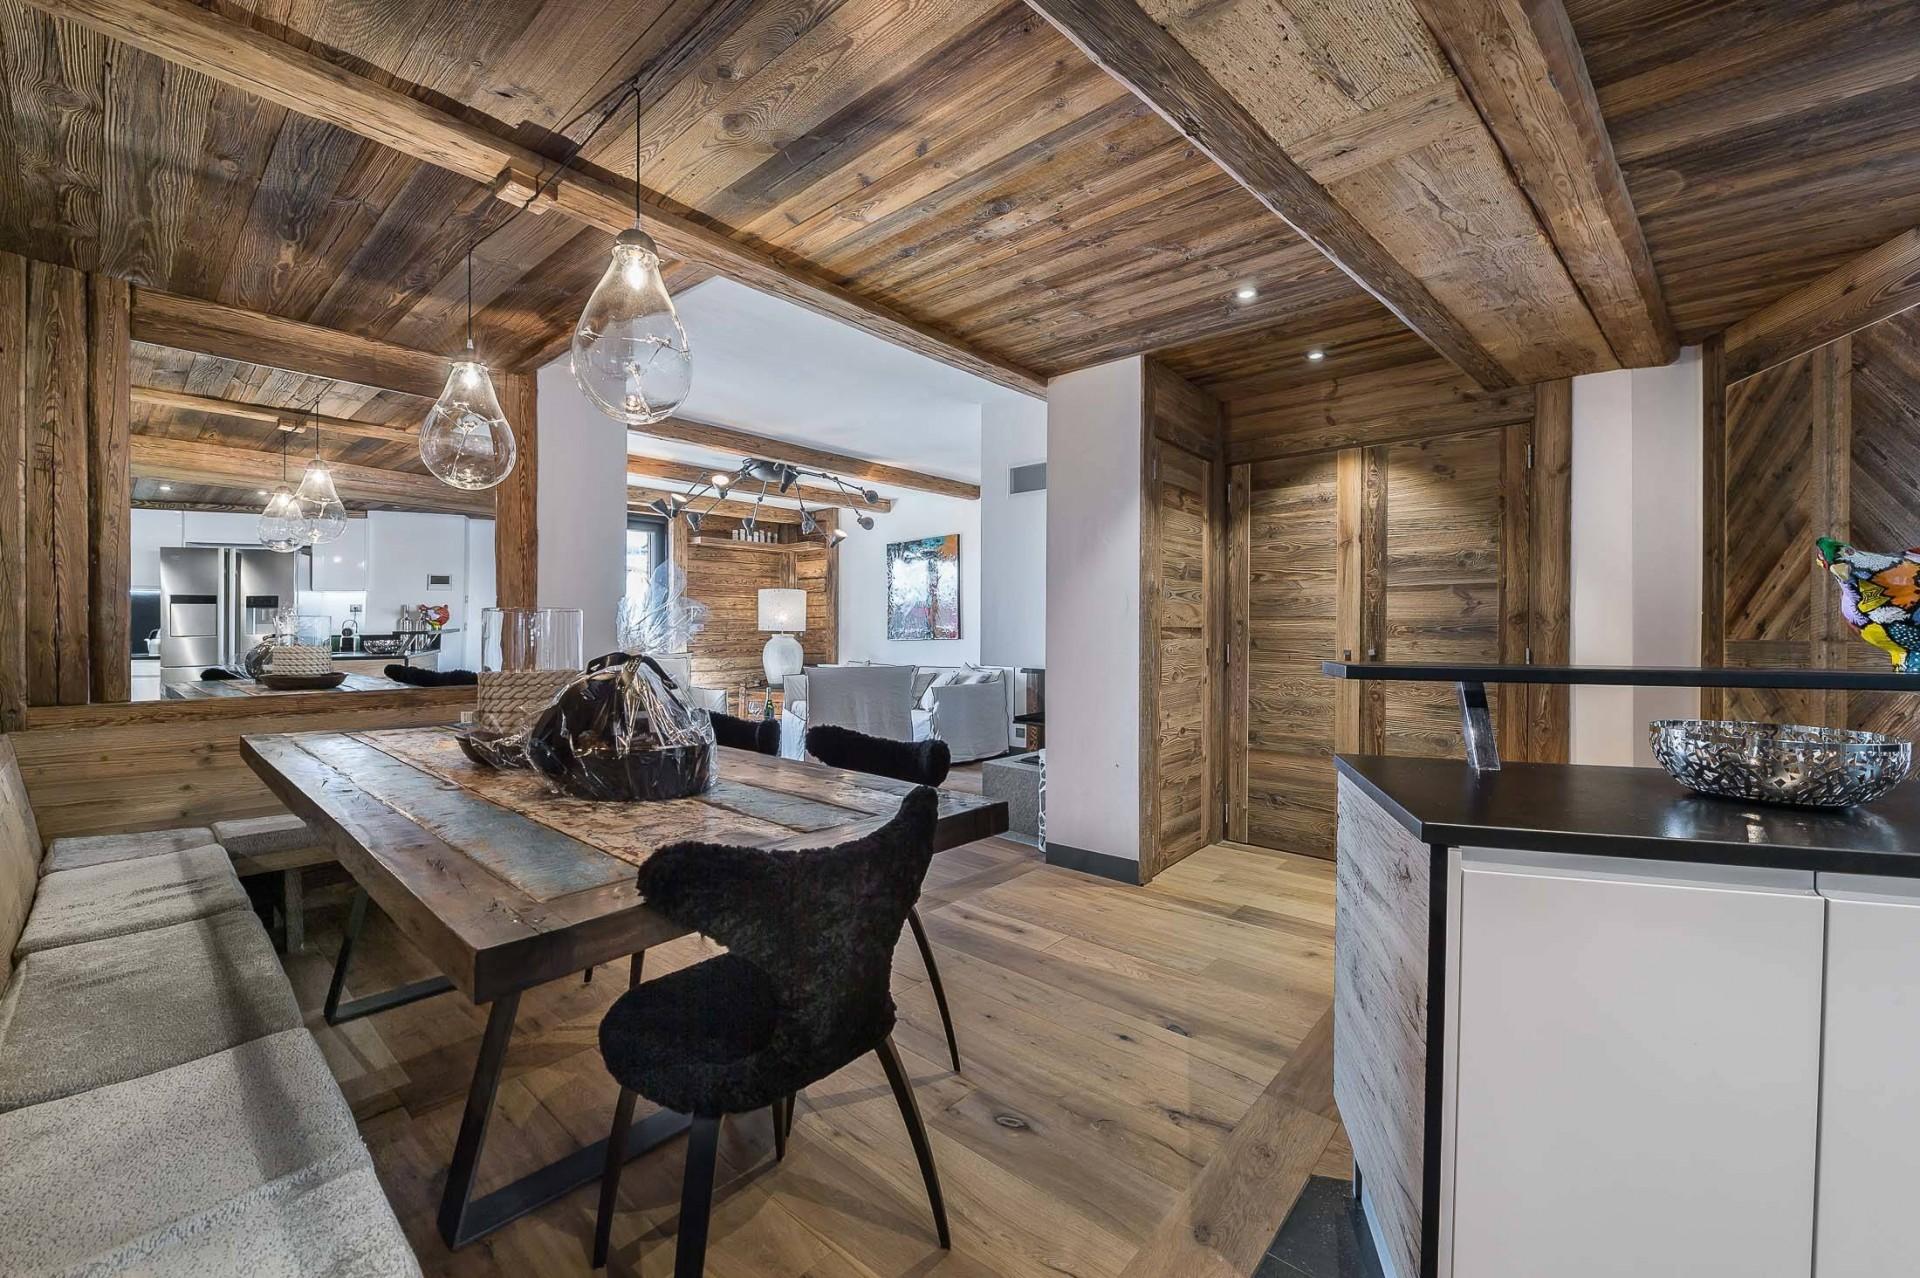 Val d'Isère Location Appartement Luxe Ucelite Salle A Manger 2